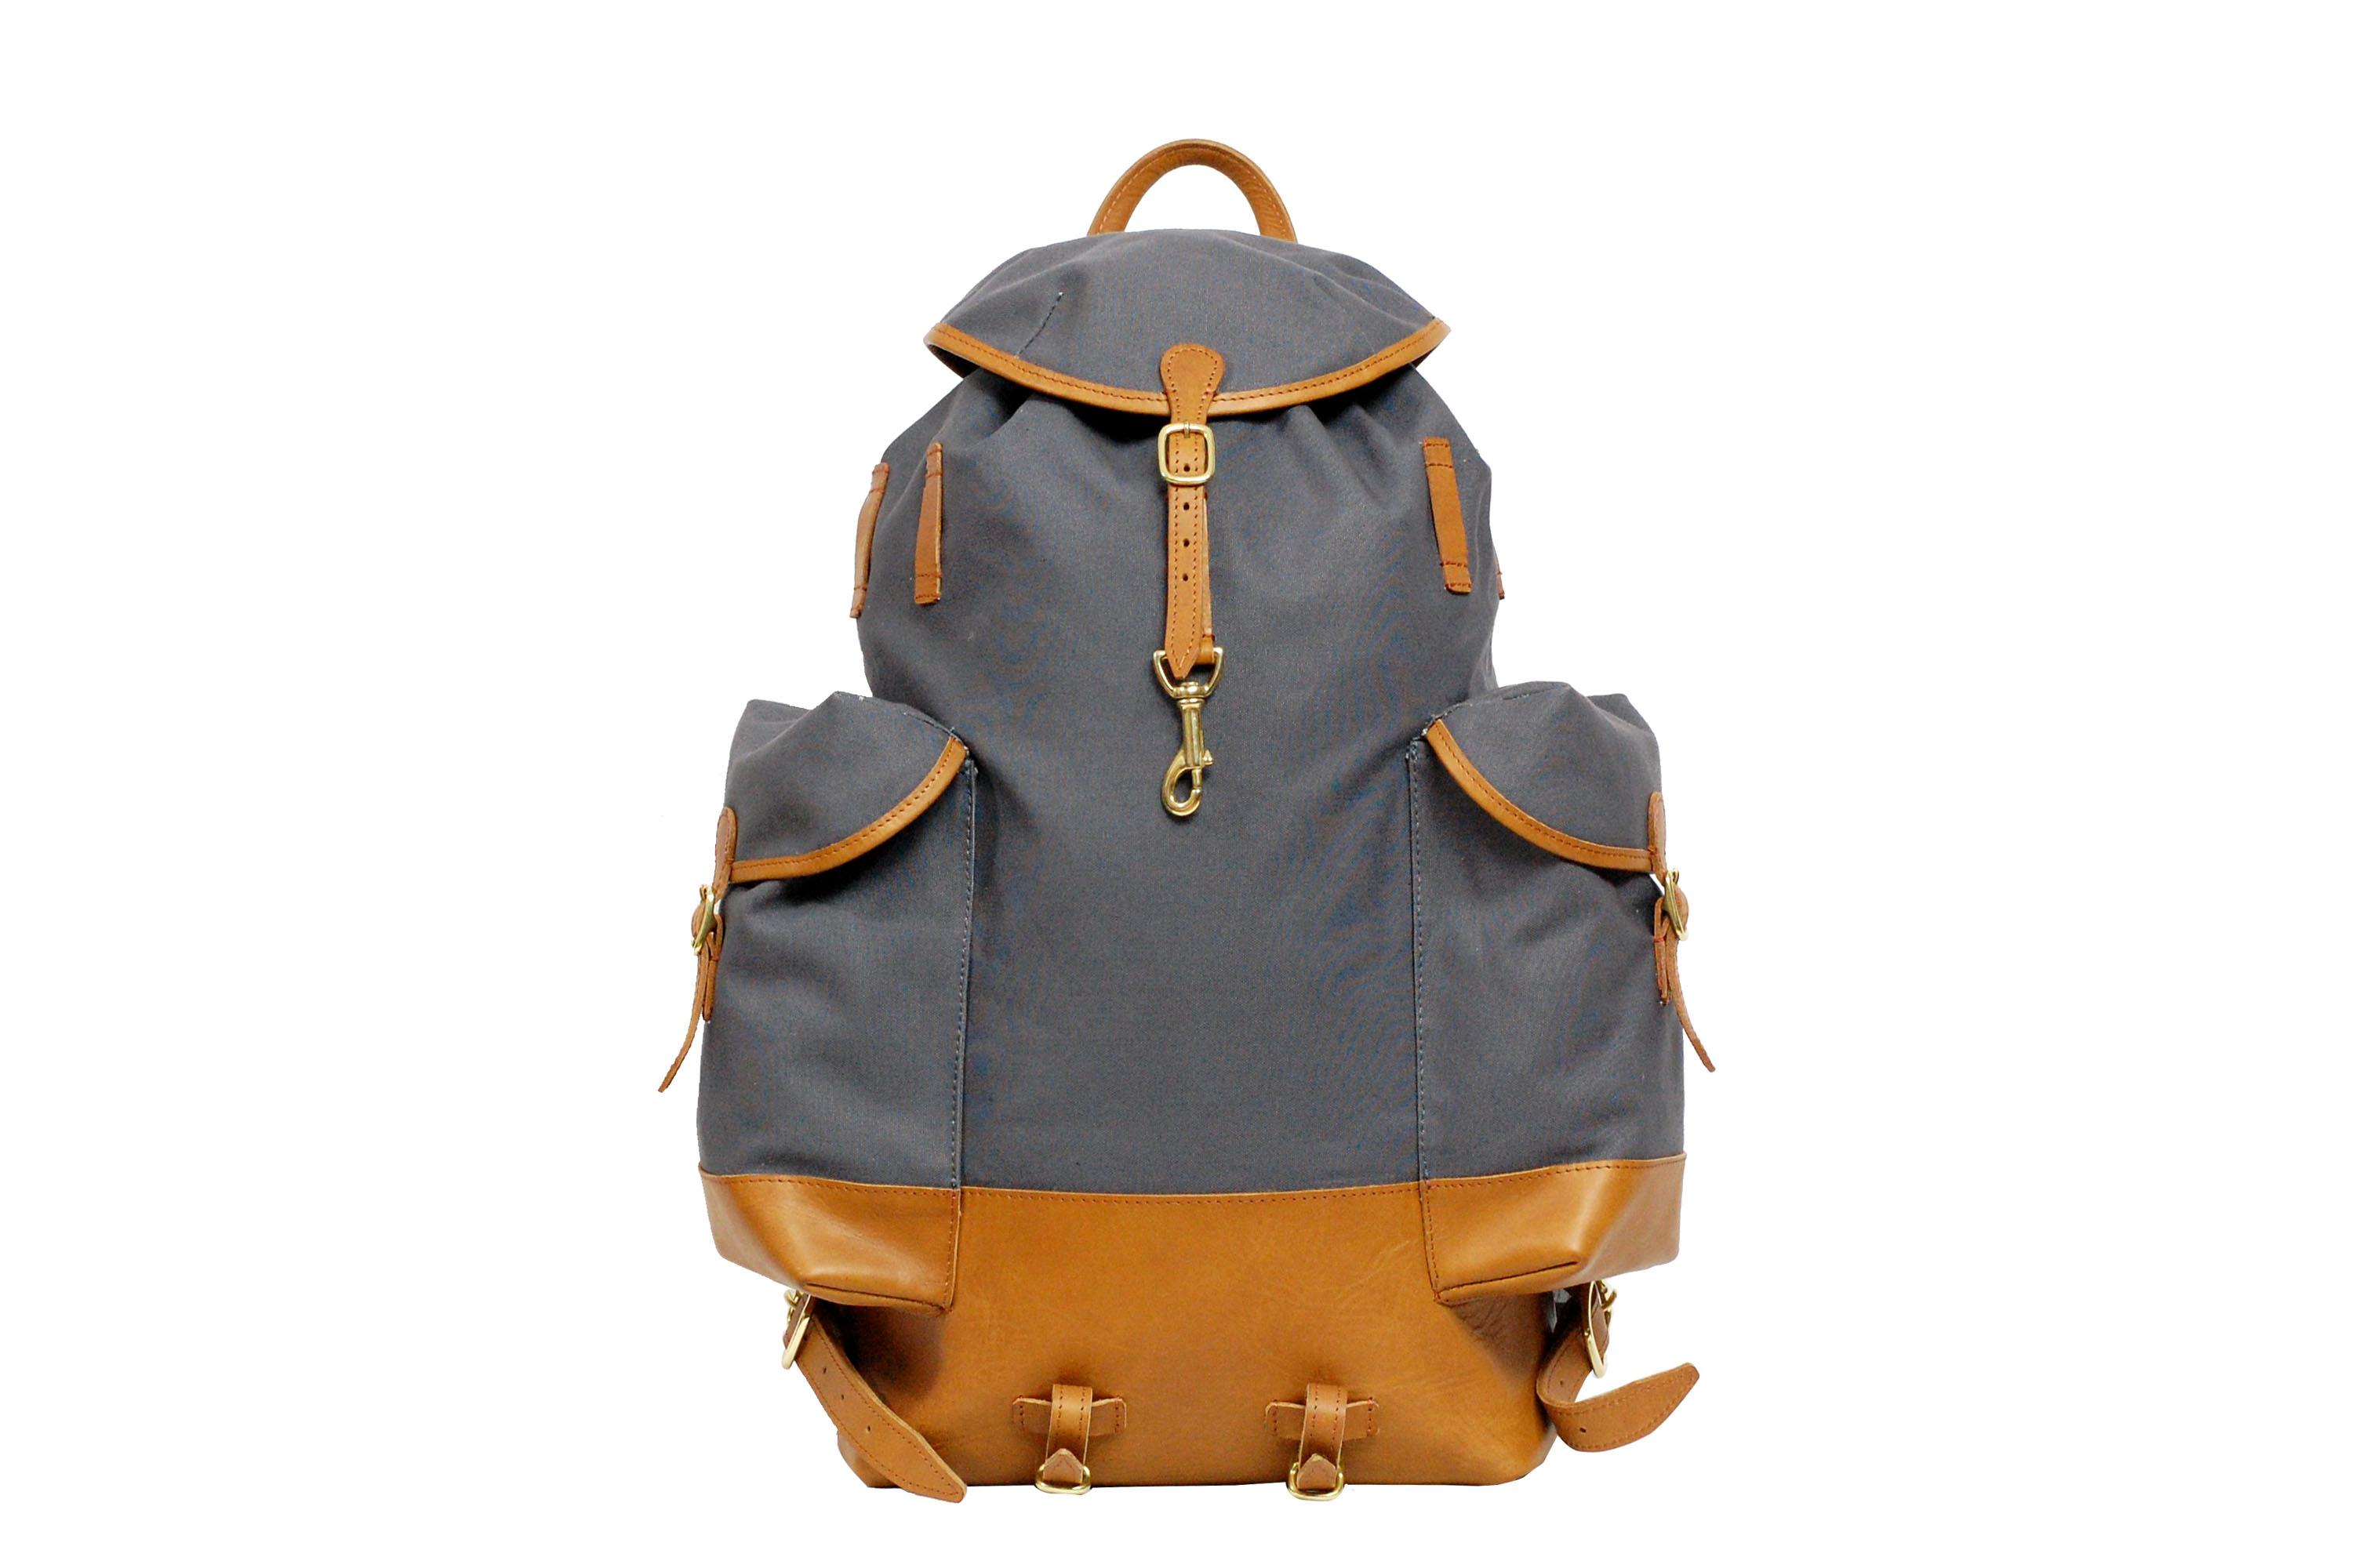 mahiout perce-neige backpack, designer bag, luxury